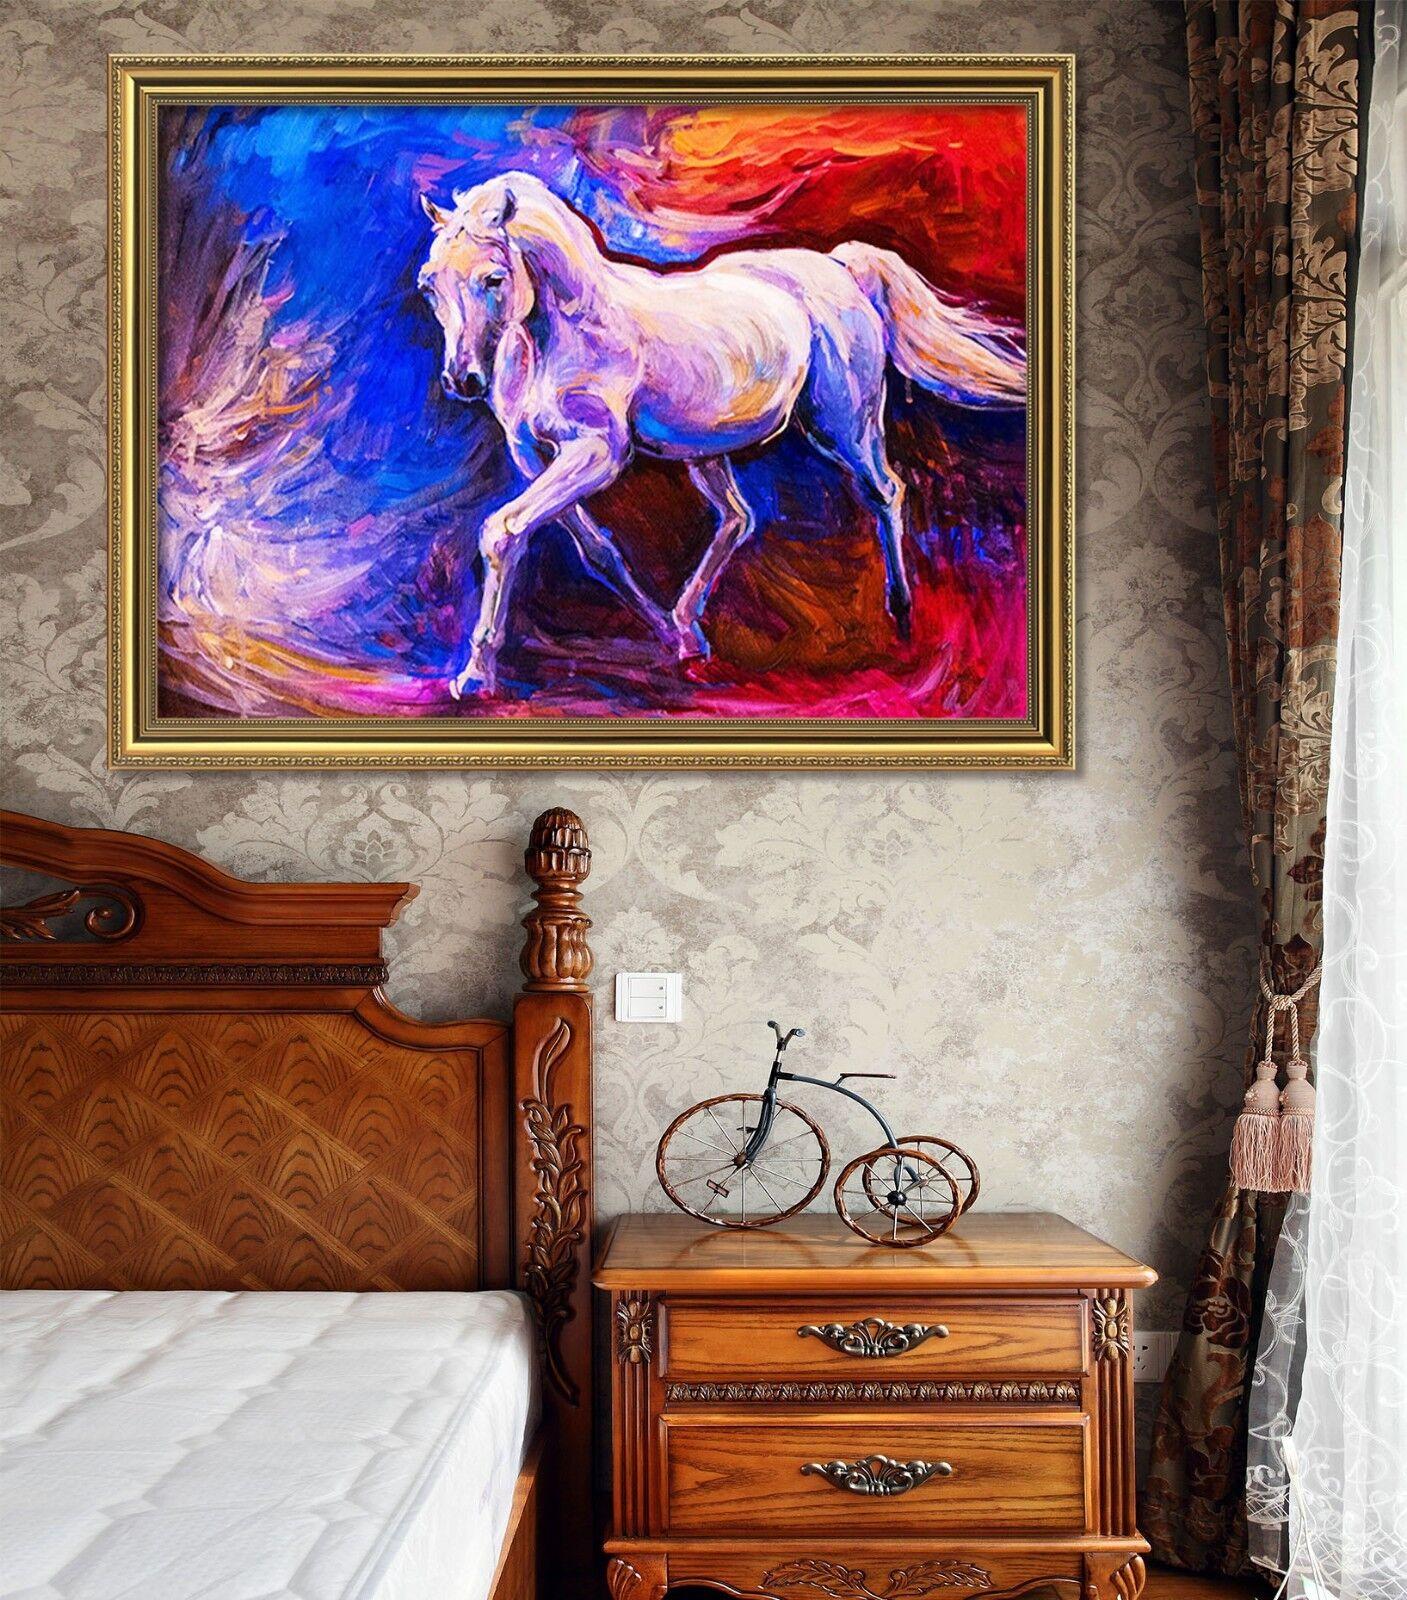 3D pintura al óleo Caballo 5 Póster Enmarcado Decoración del Hogar Pintura de Impresión Arte AJ Wallpaper